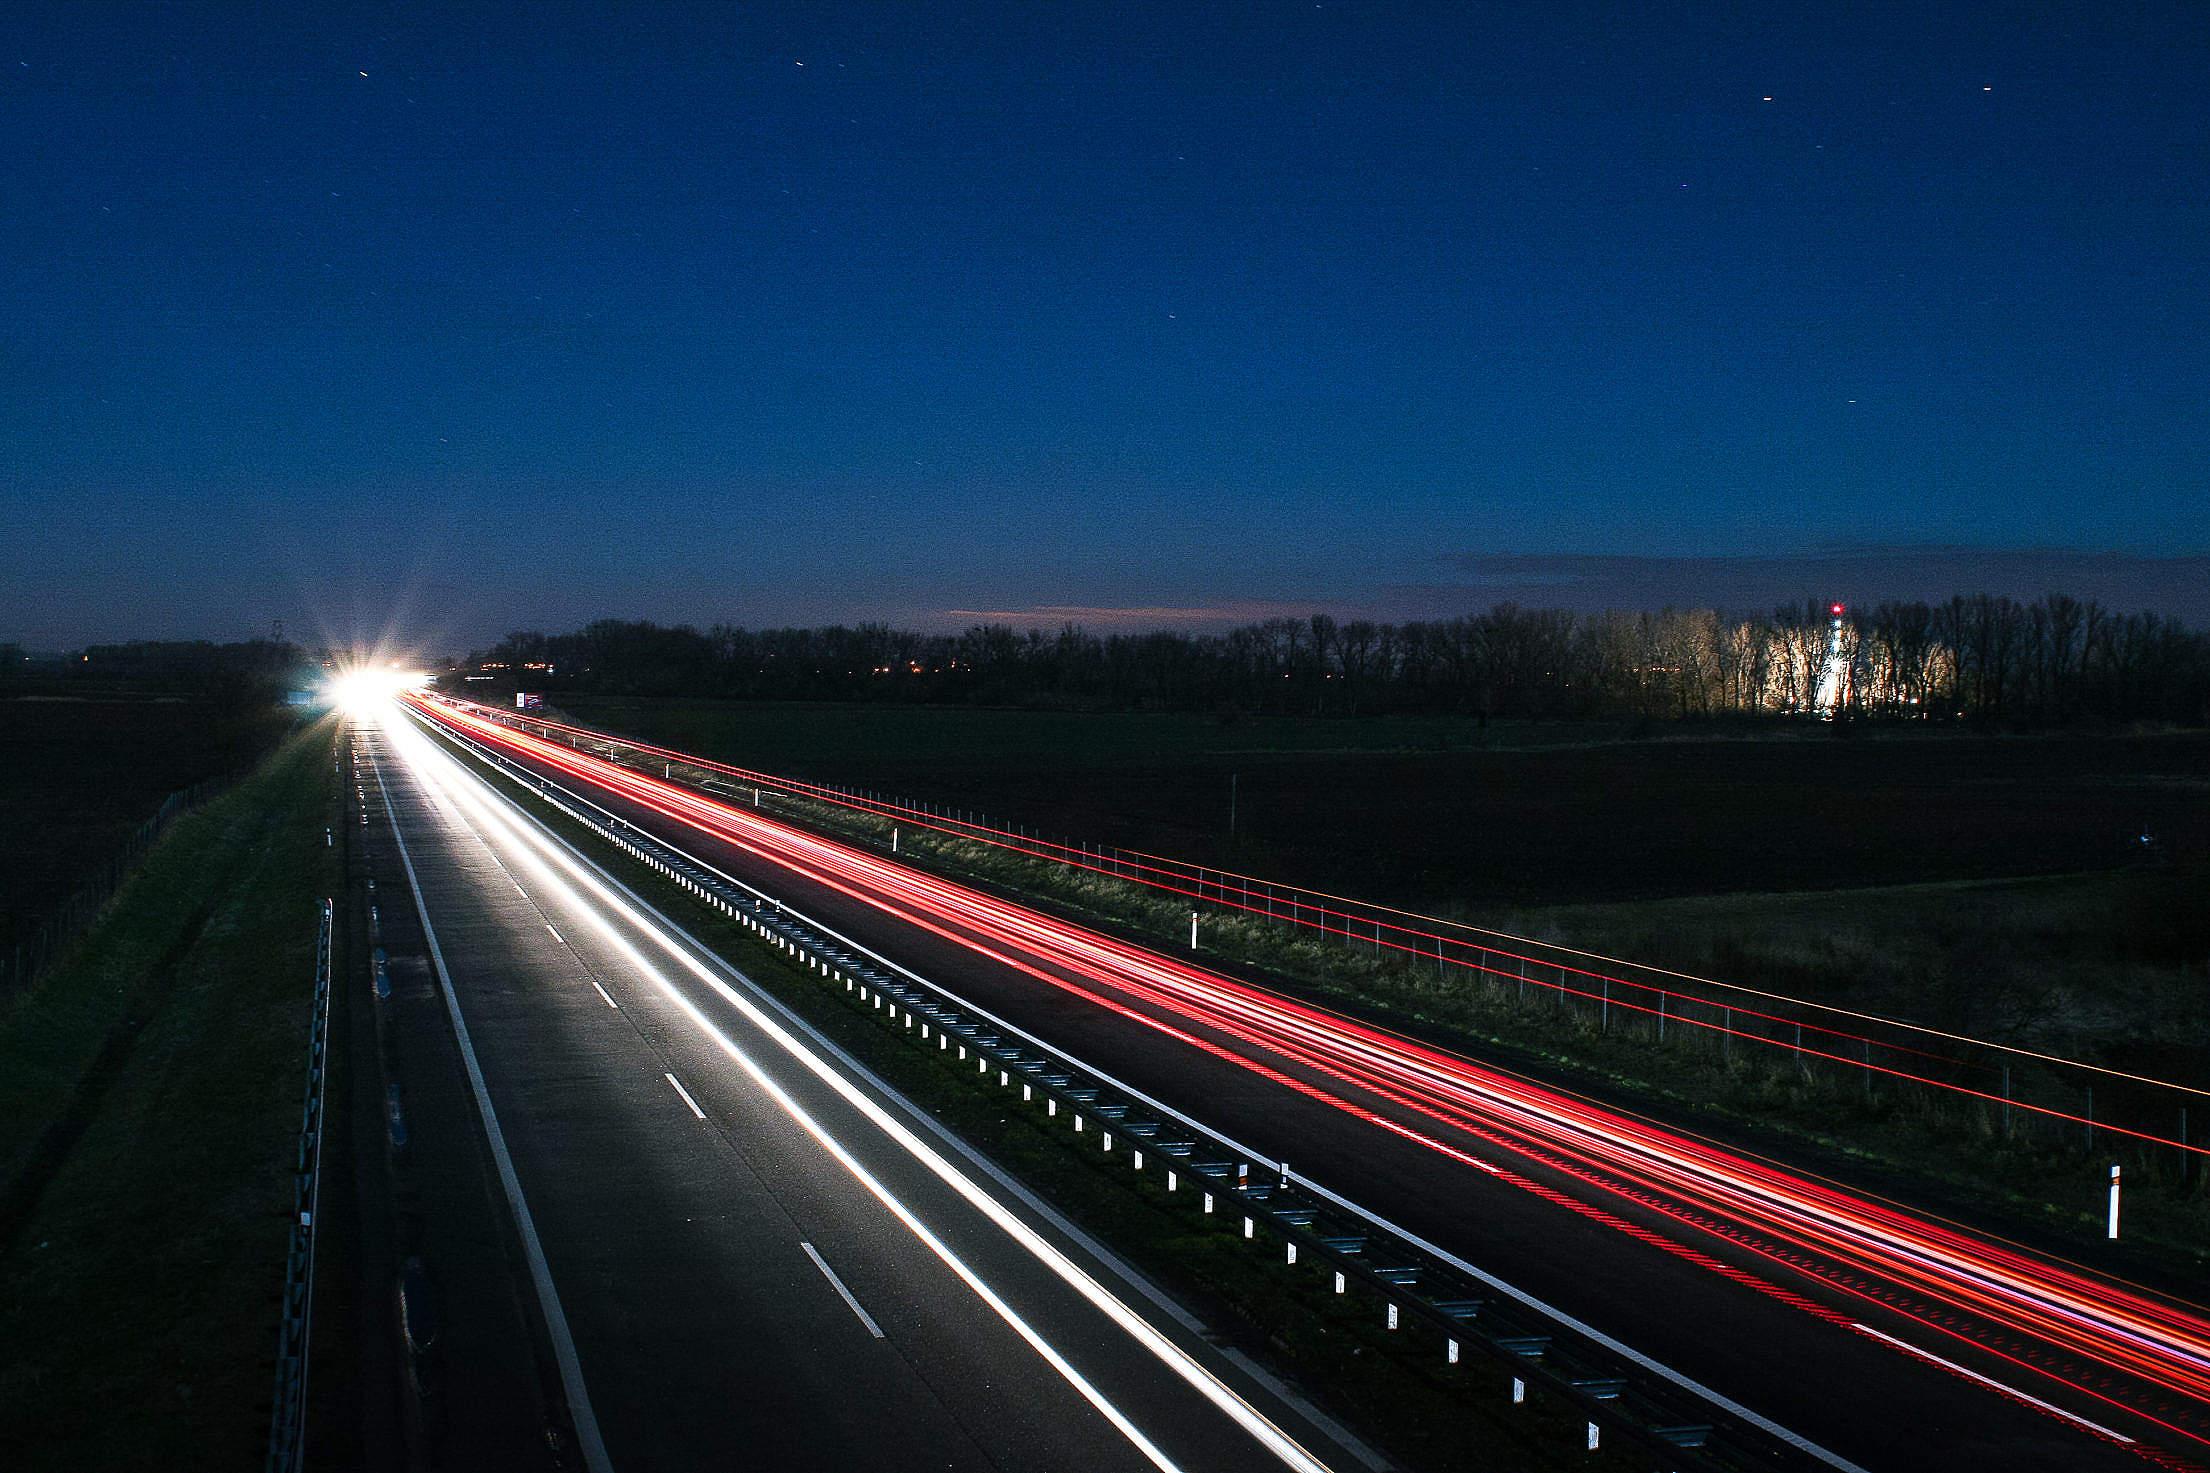 Highway at Night Free Stock Photo Download | picjumbo